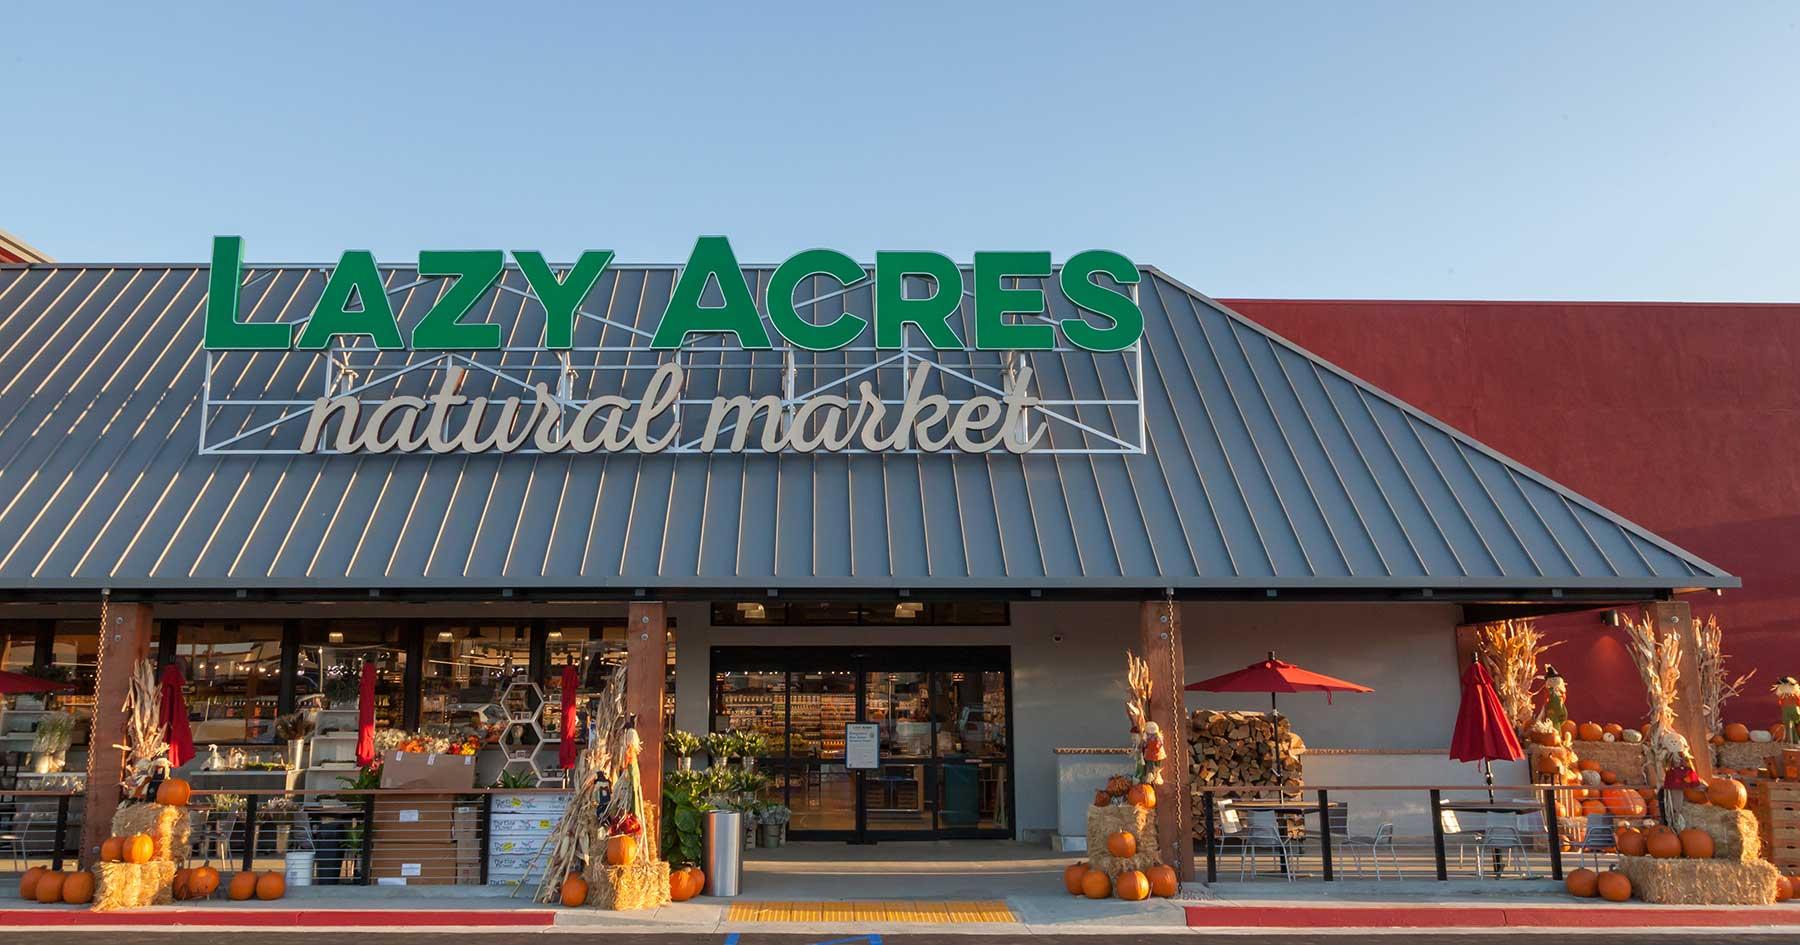 Lazy Acres exterior